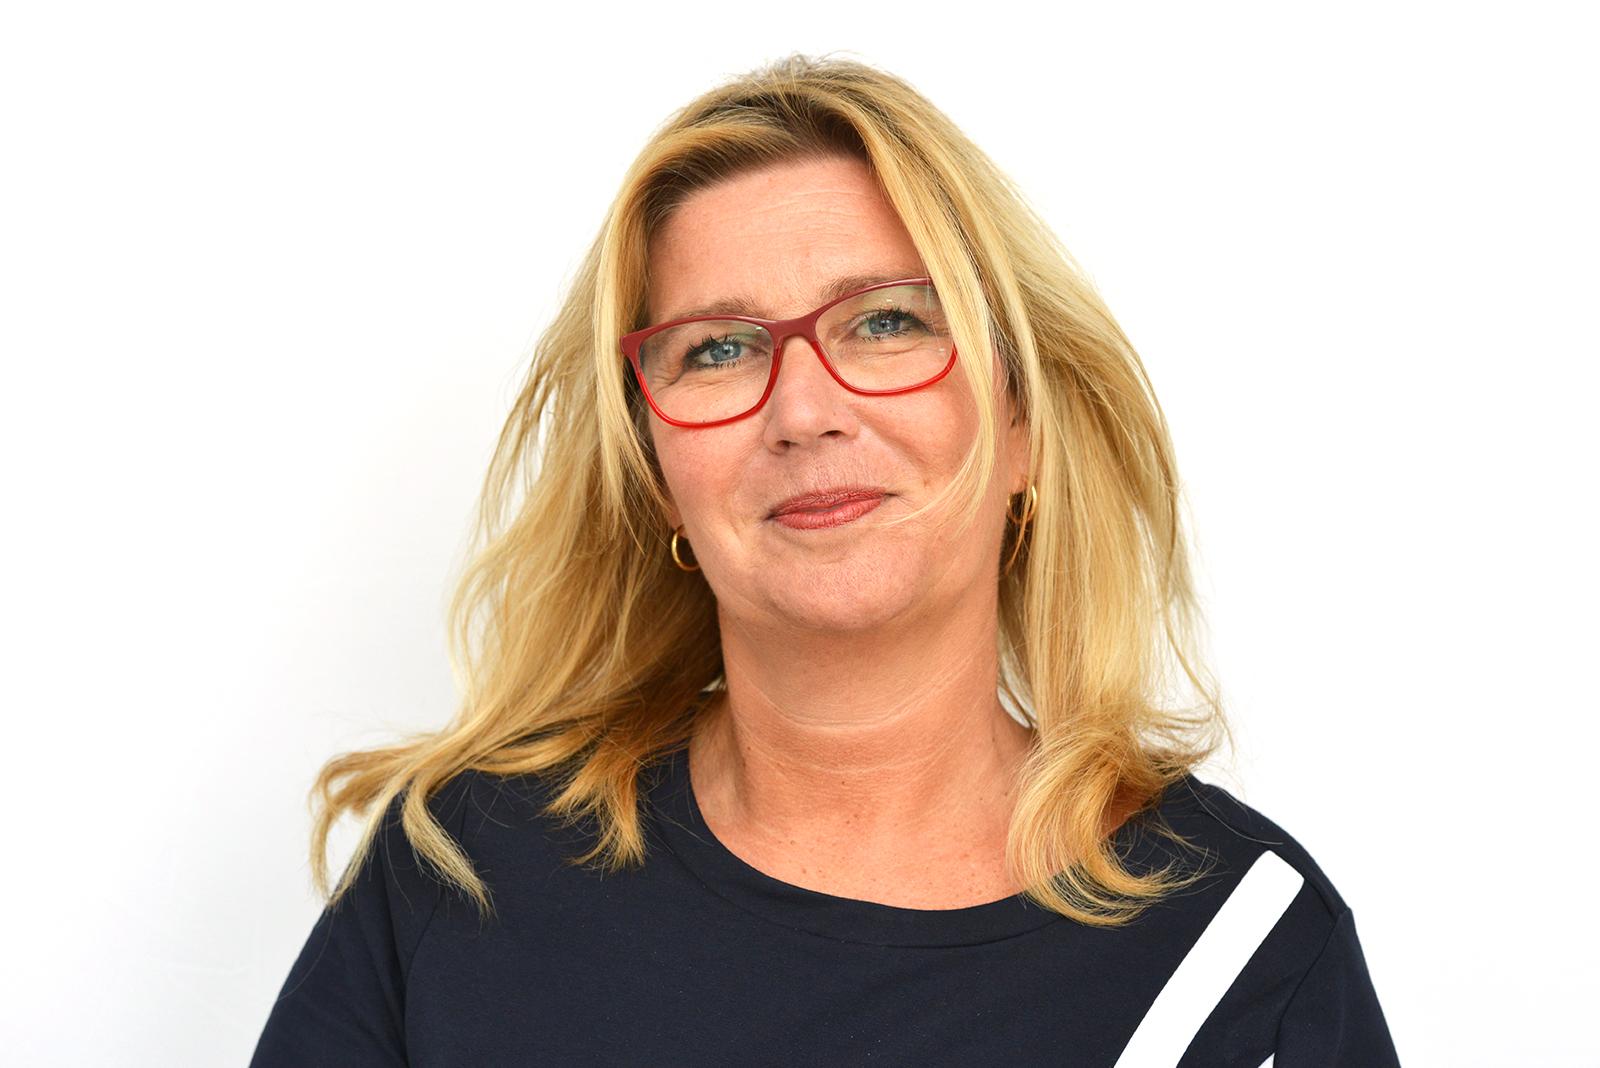 Miranda Stoppelenburg